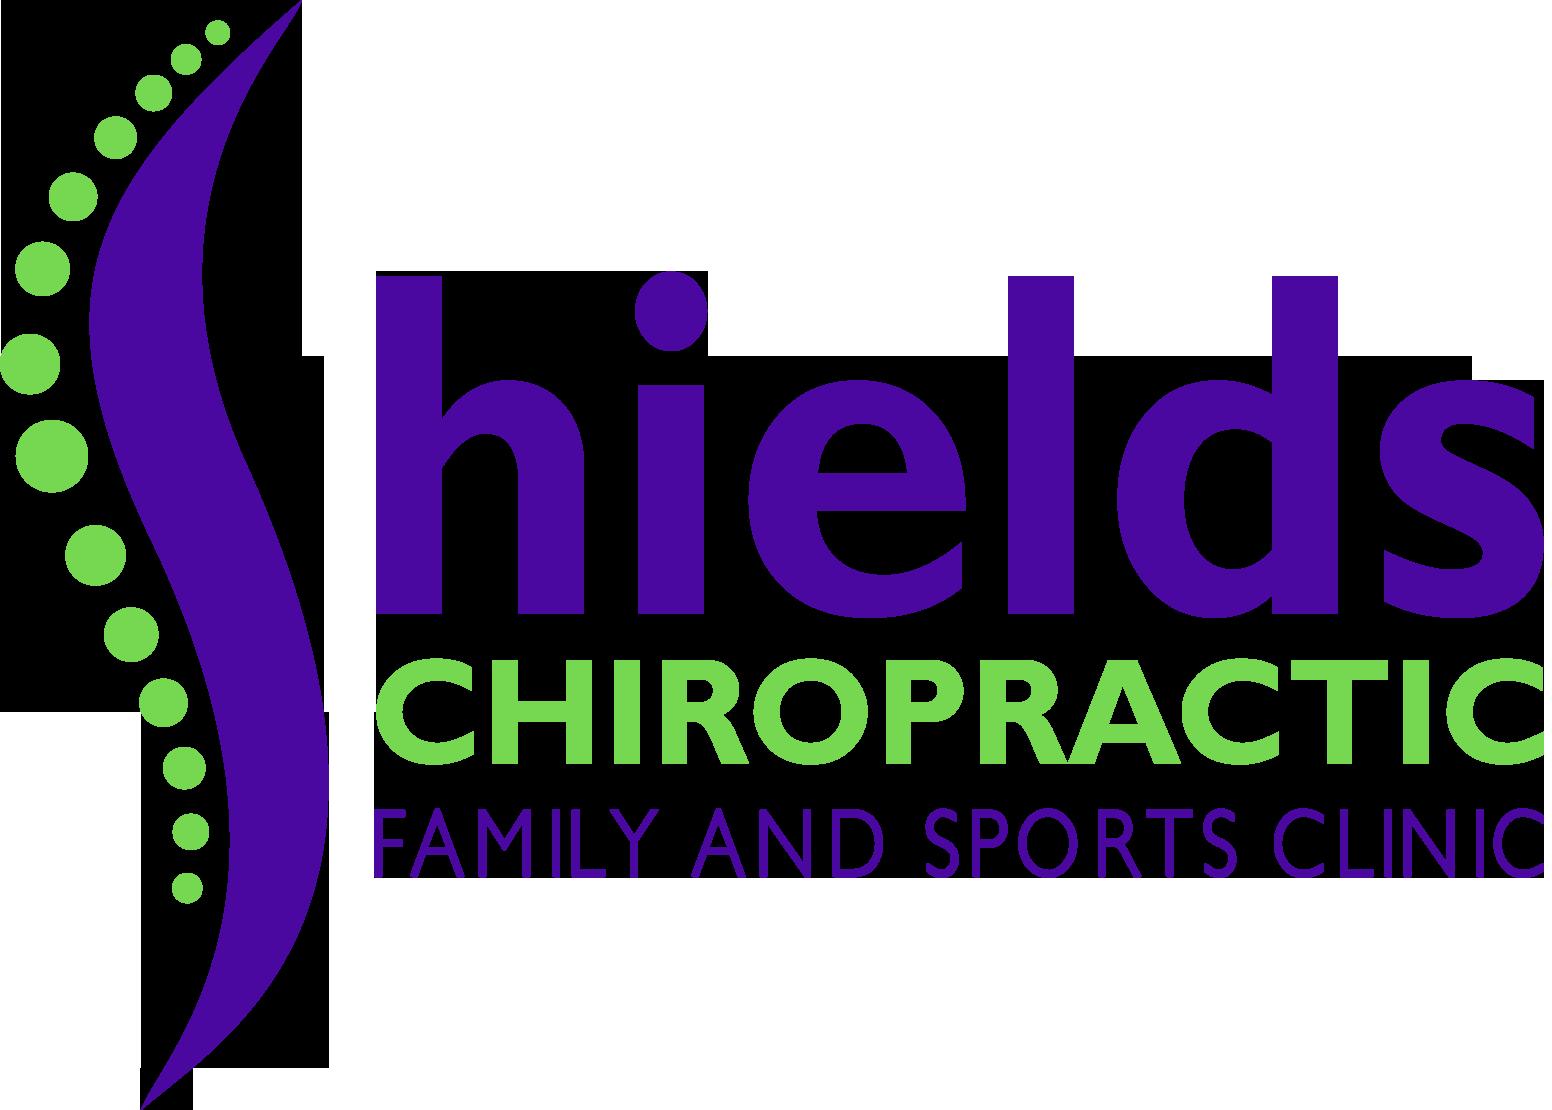 Shields Chiropractic Logo